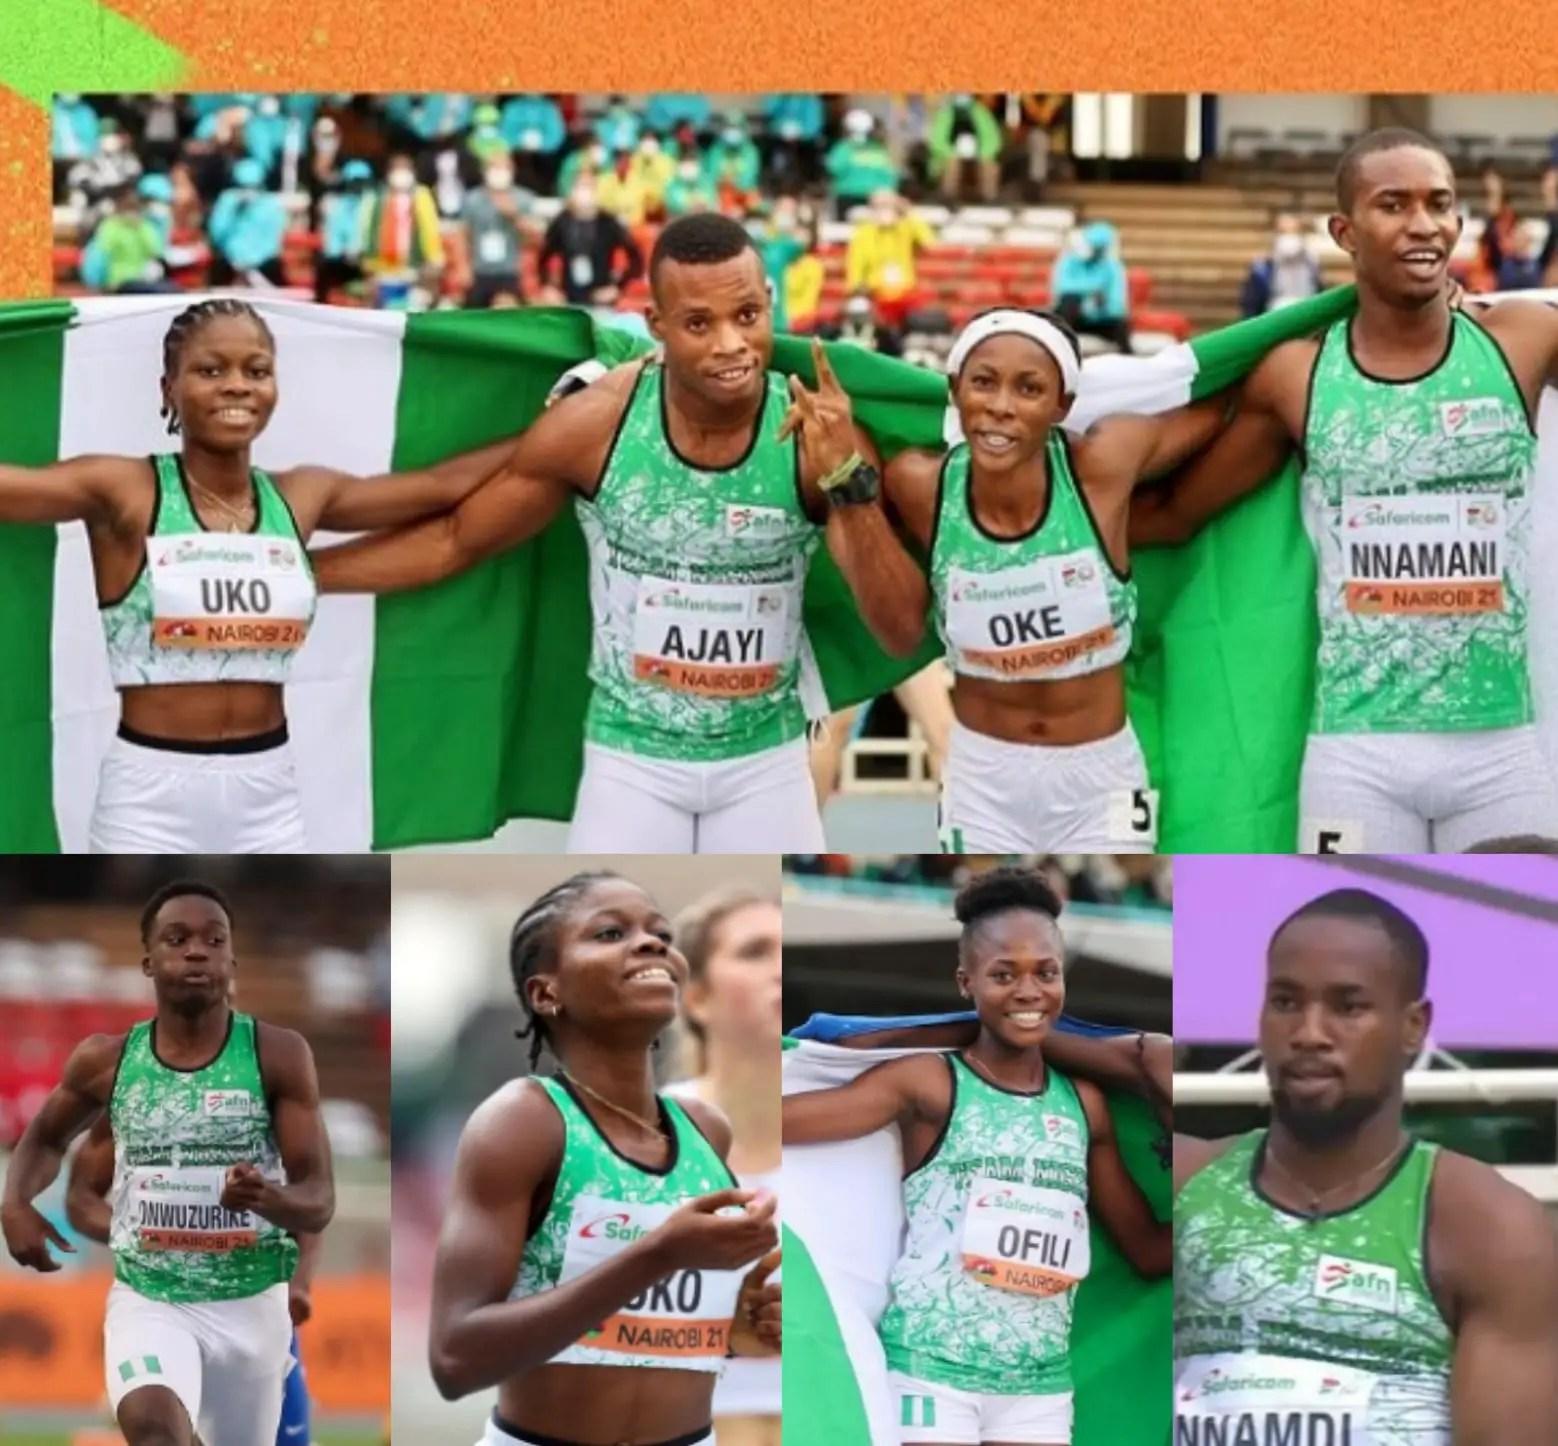 World Athletics U-20: Sports Minister Announces Cash Awards For Team Nigeria's Medallists; NCAA Rules Upheld